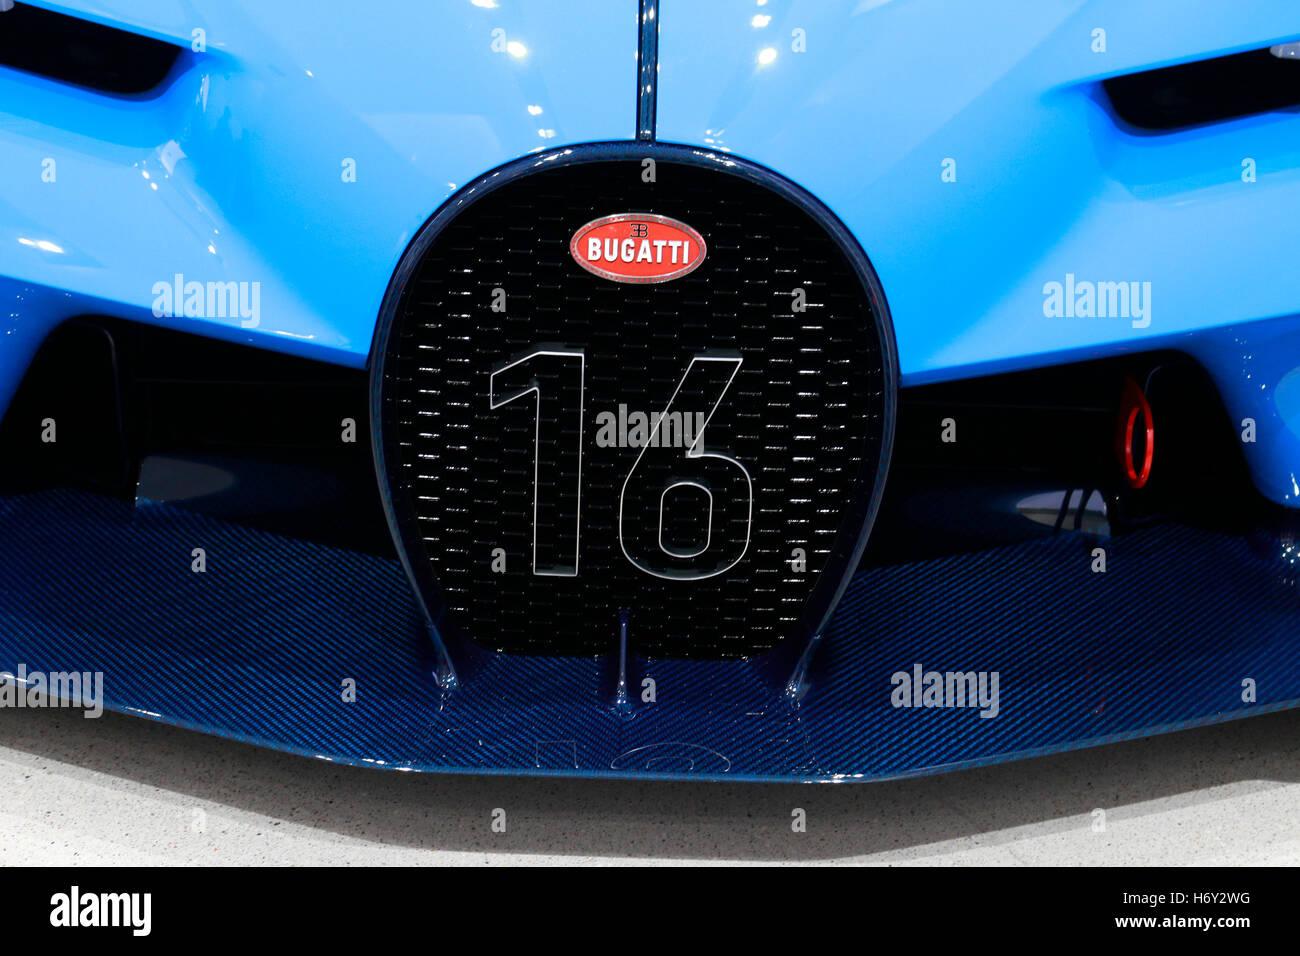 der Rennwagen Bugatti Vision Gran Turismo, Berlin. - Stock Image